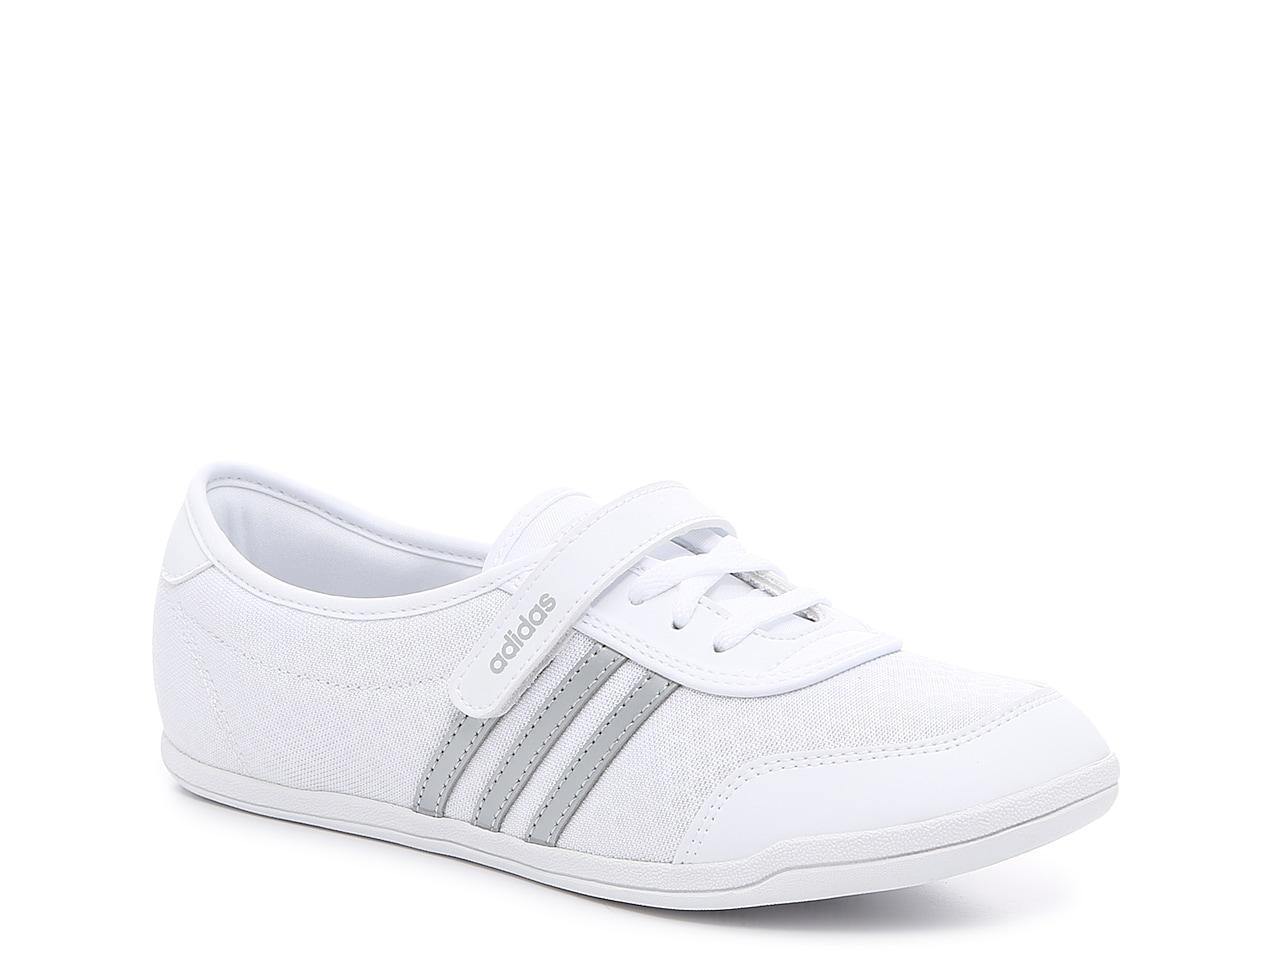 adidas Diona Slip-On Sneaker - Women's